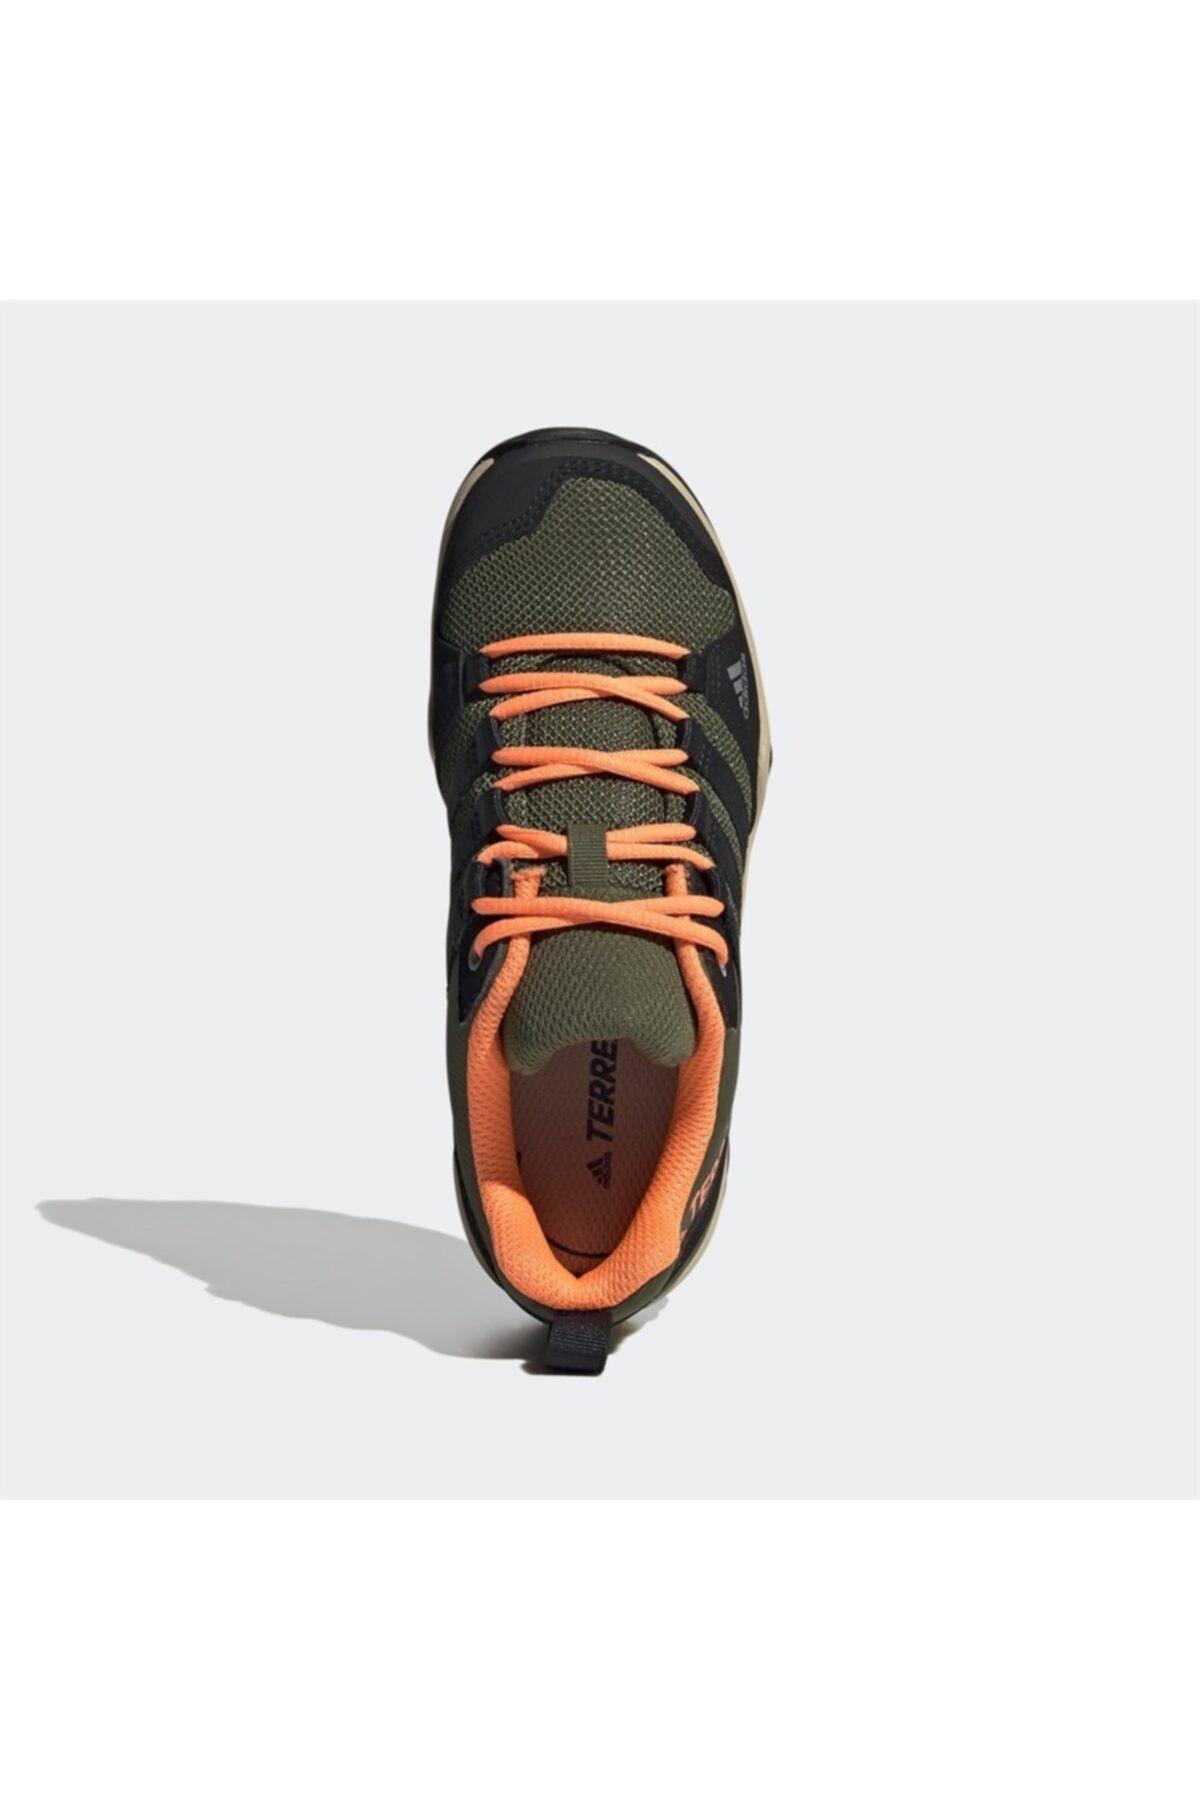 adidas Kadın Terrex Ax2r Outdoor Ayakkabı 2